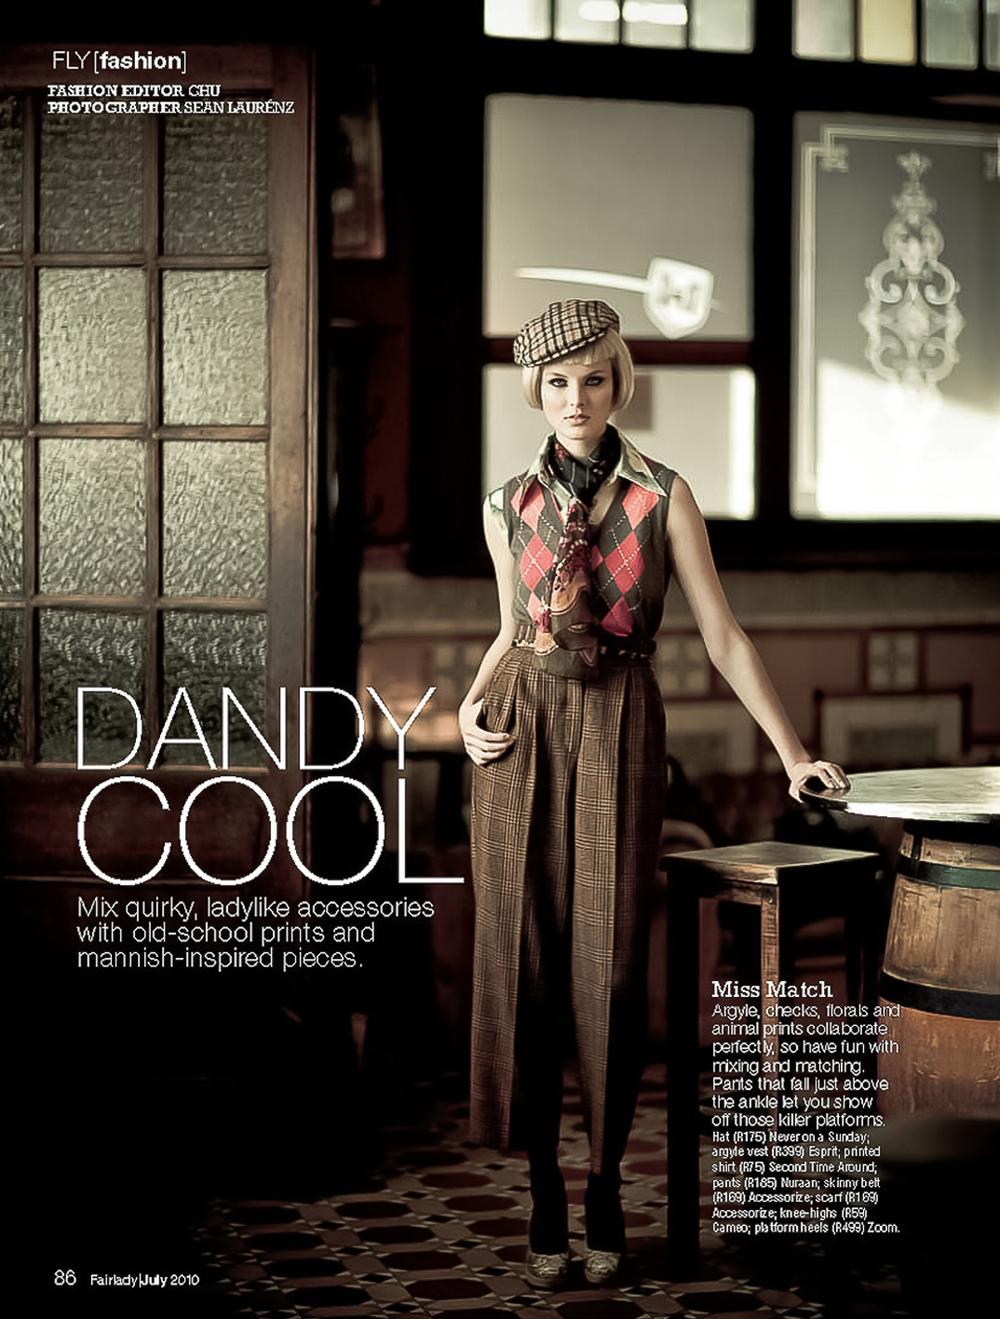 Dandy Cool